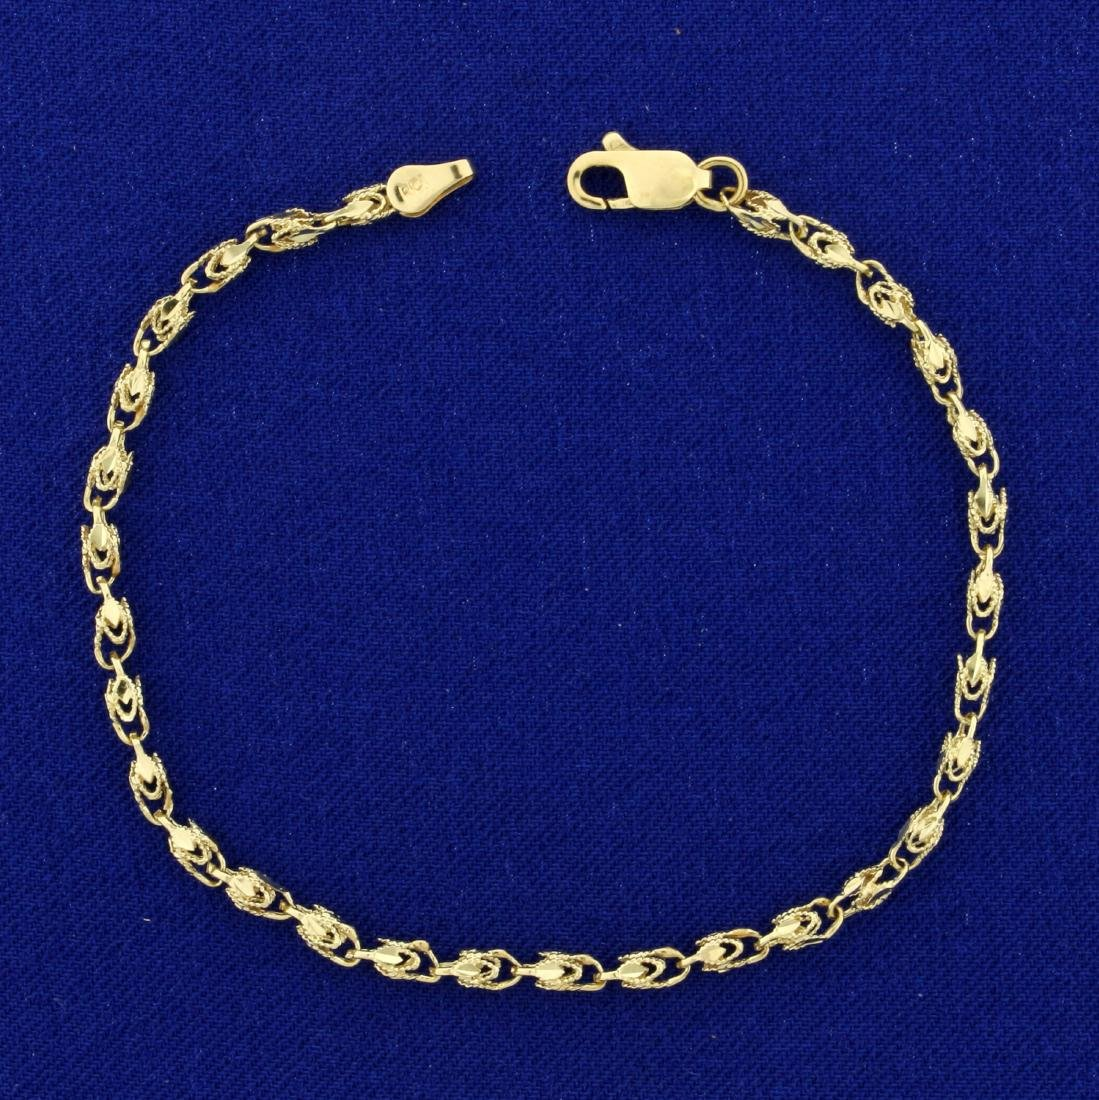 7 Inch Designer Link Bracelet in 10K Yellow Gold